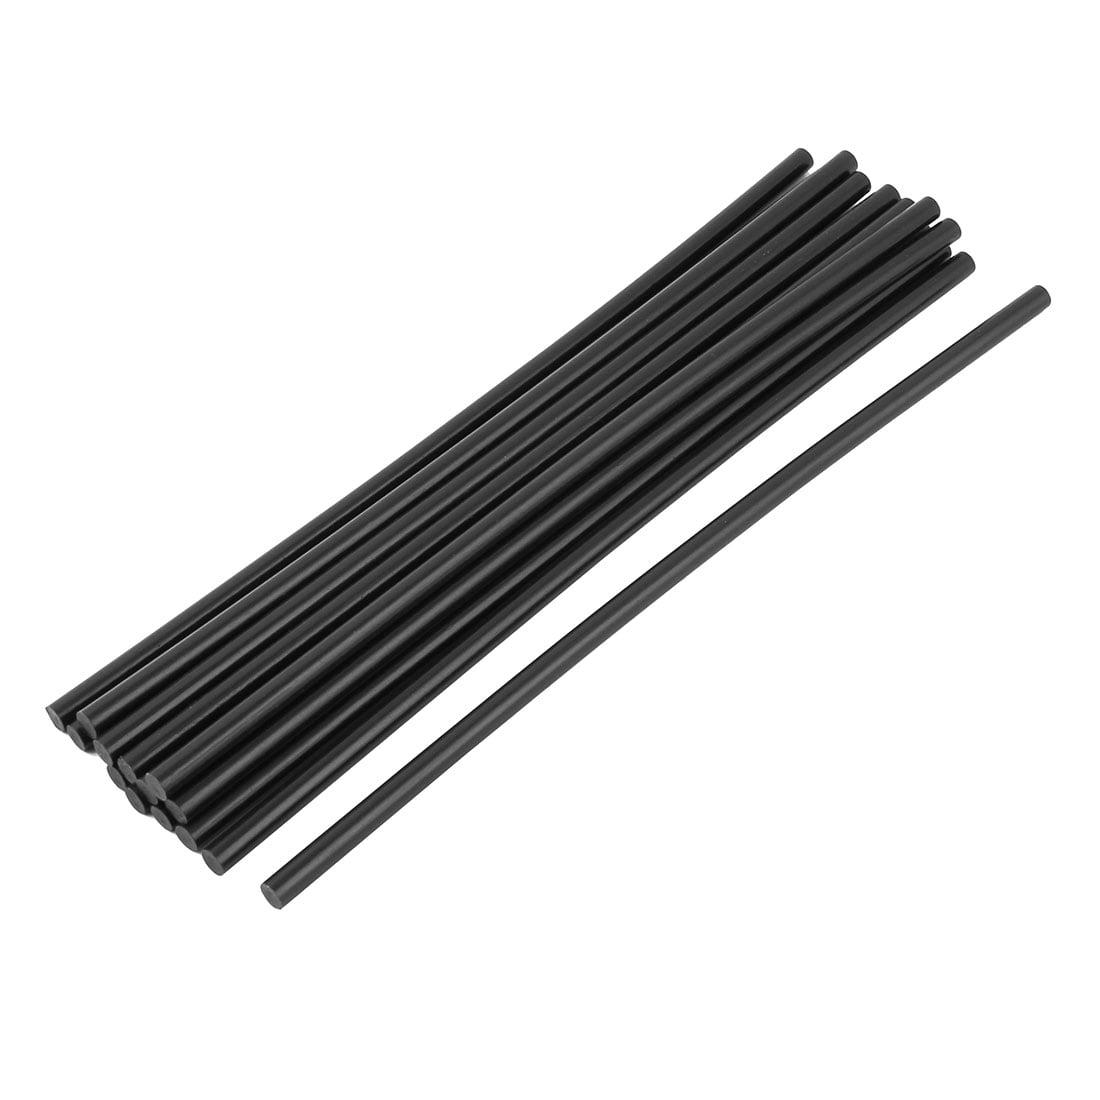 15pcs 7mm Diameter Black Craft Model Bonding Adhesive Stick Hot Melt Glue